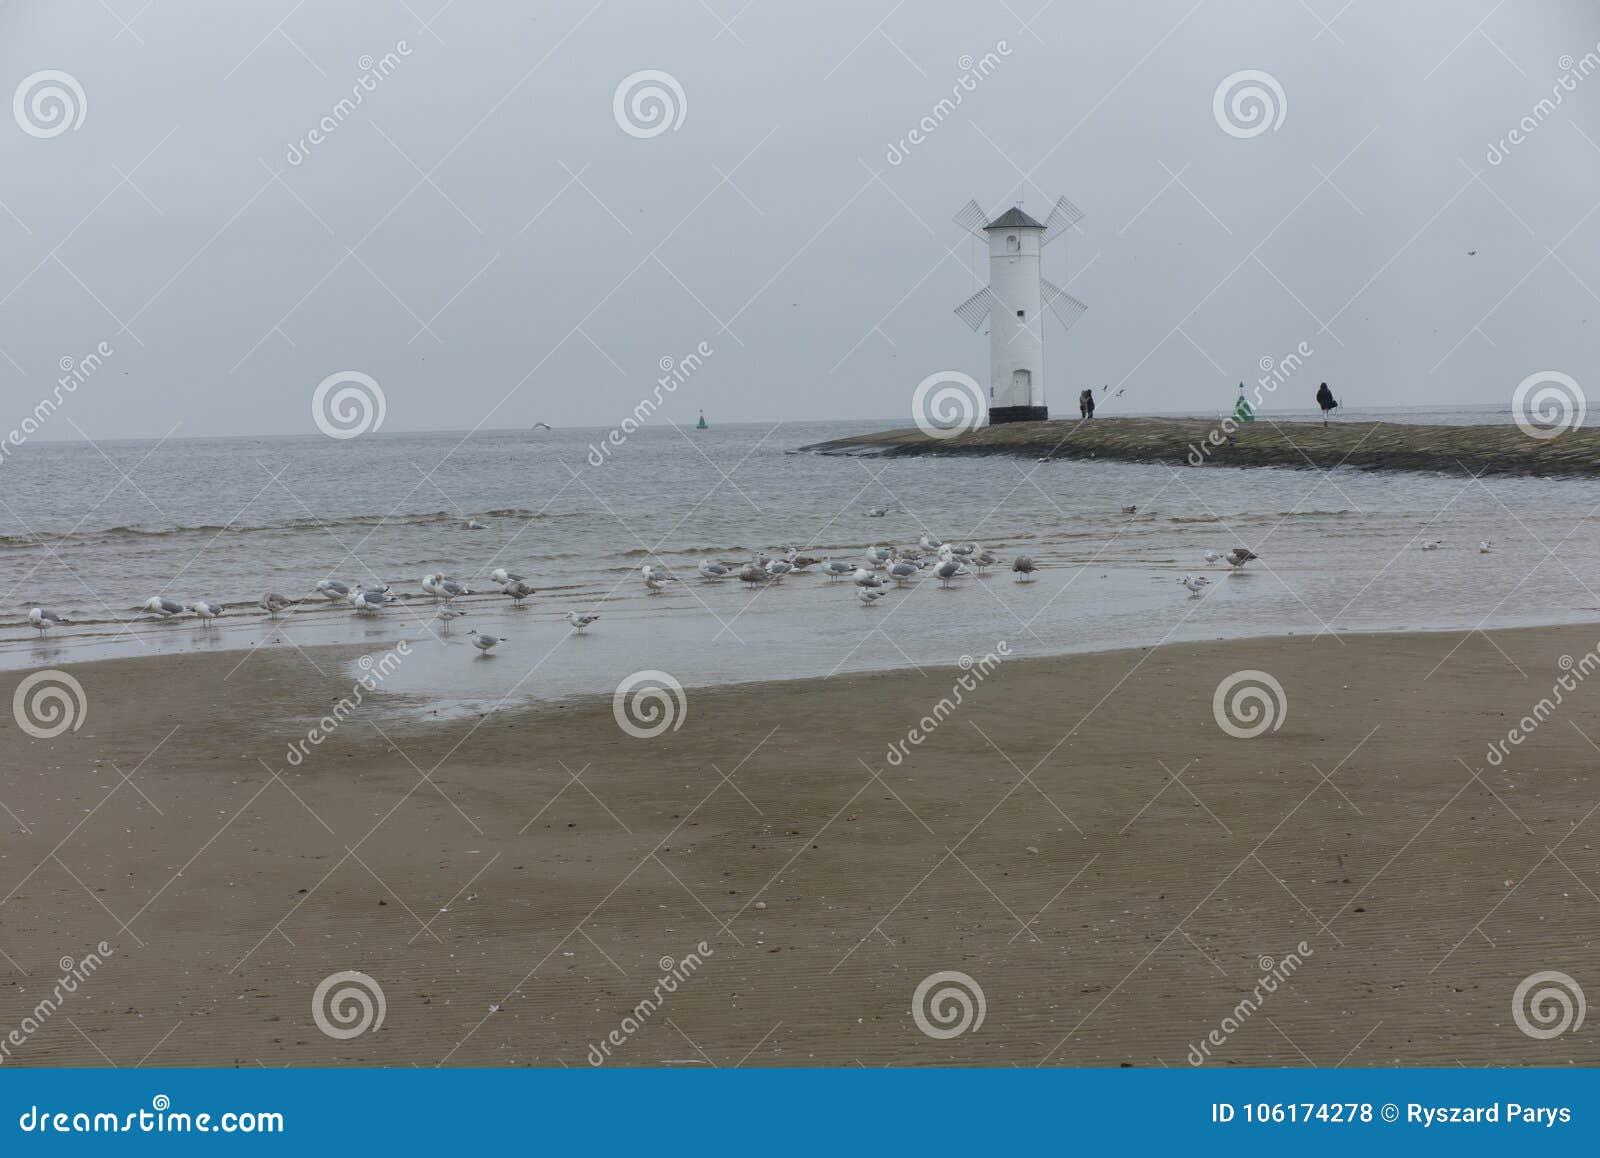 Swinoujscie, Poland, November 10, 2017: Sea Community when enter